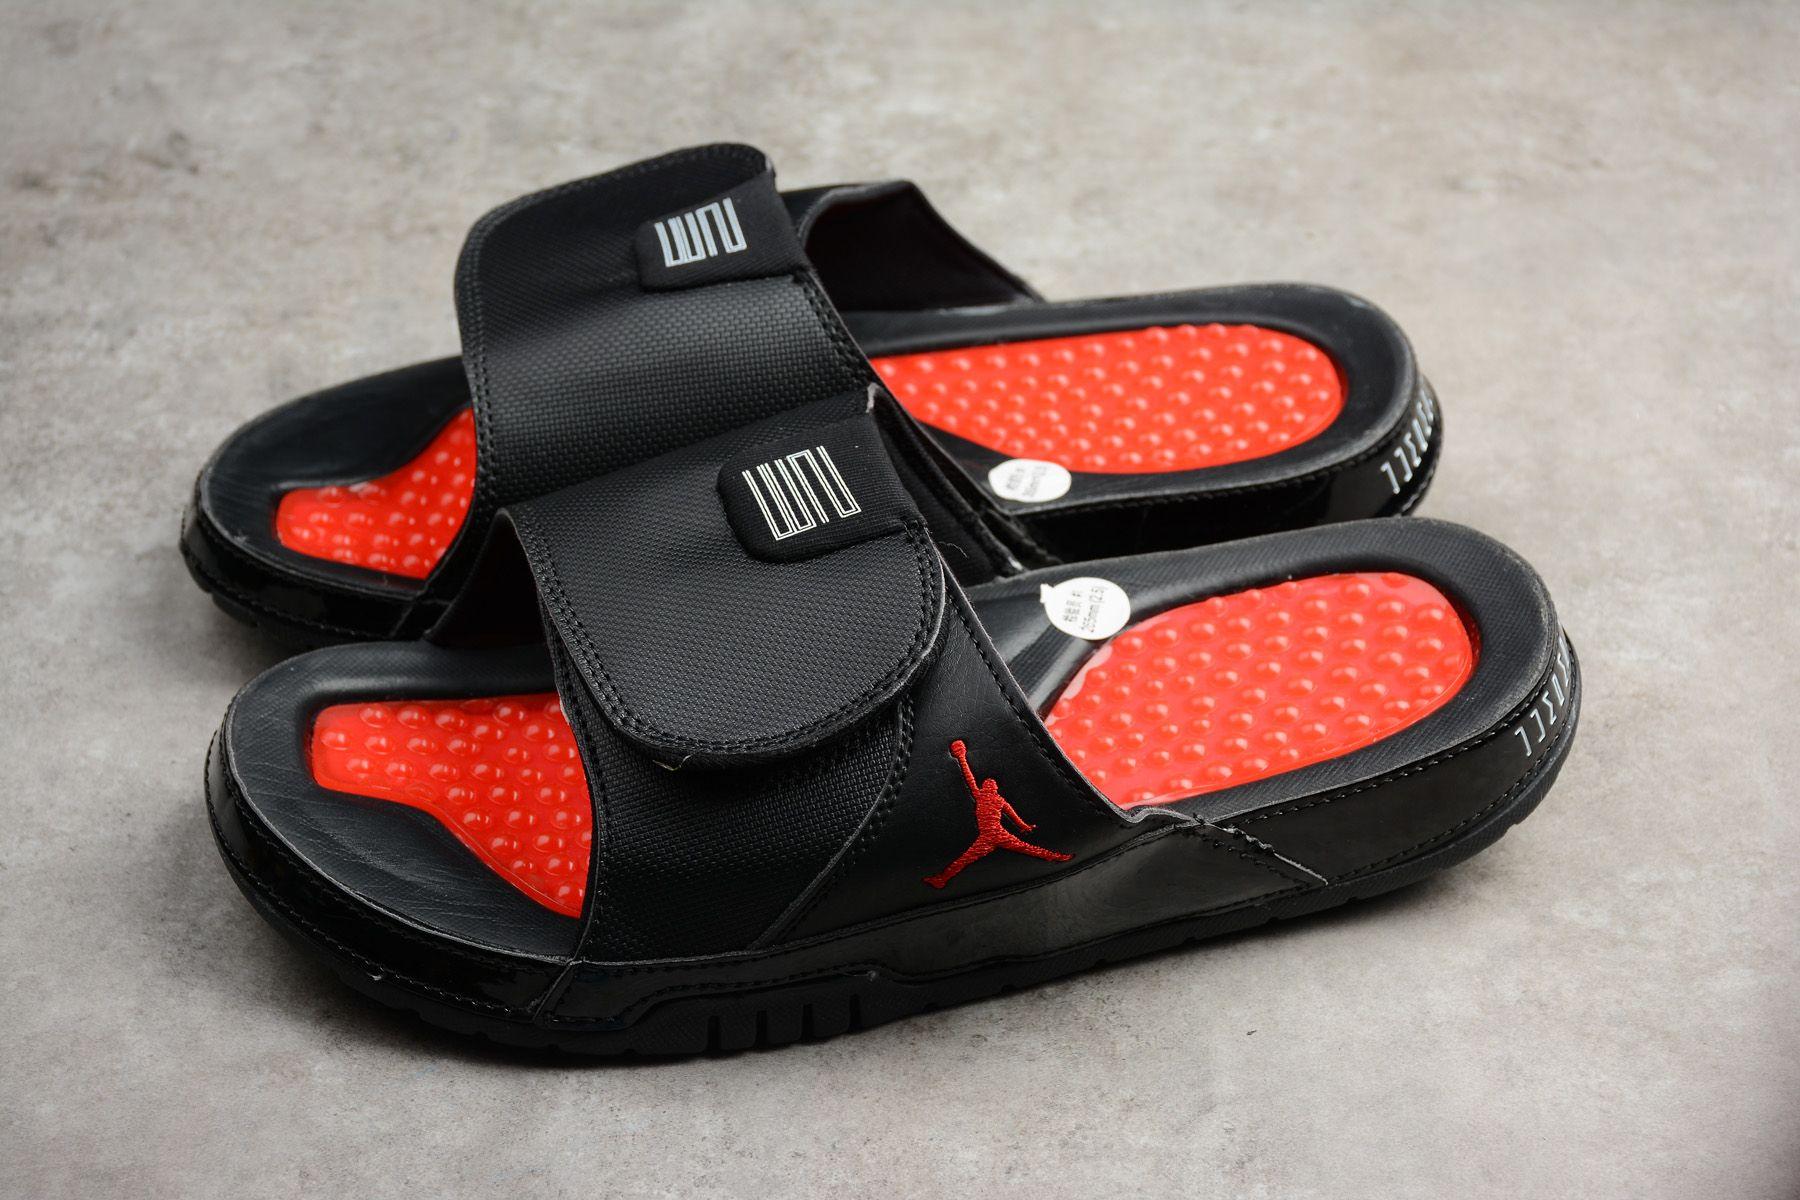 721114793f0 Where to buy Air Jordan 11 Hydro Slides Bred Sandals | Jordan Release Dates  2018